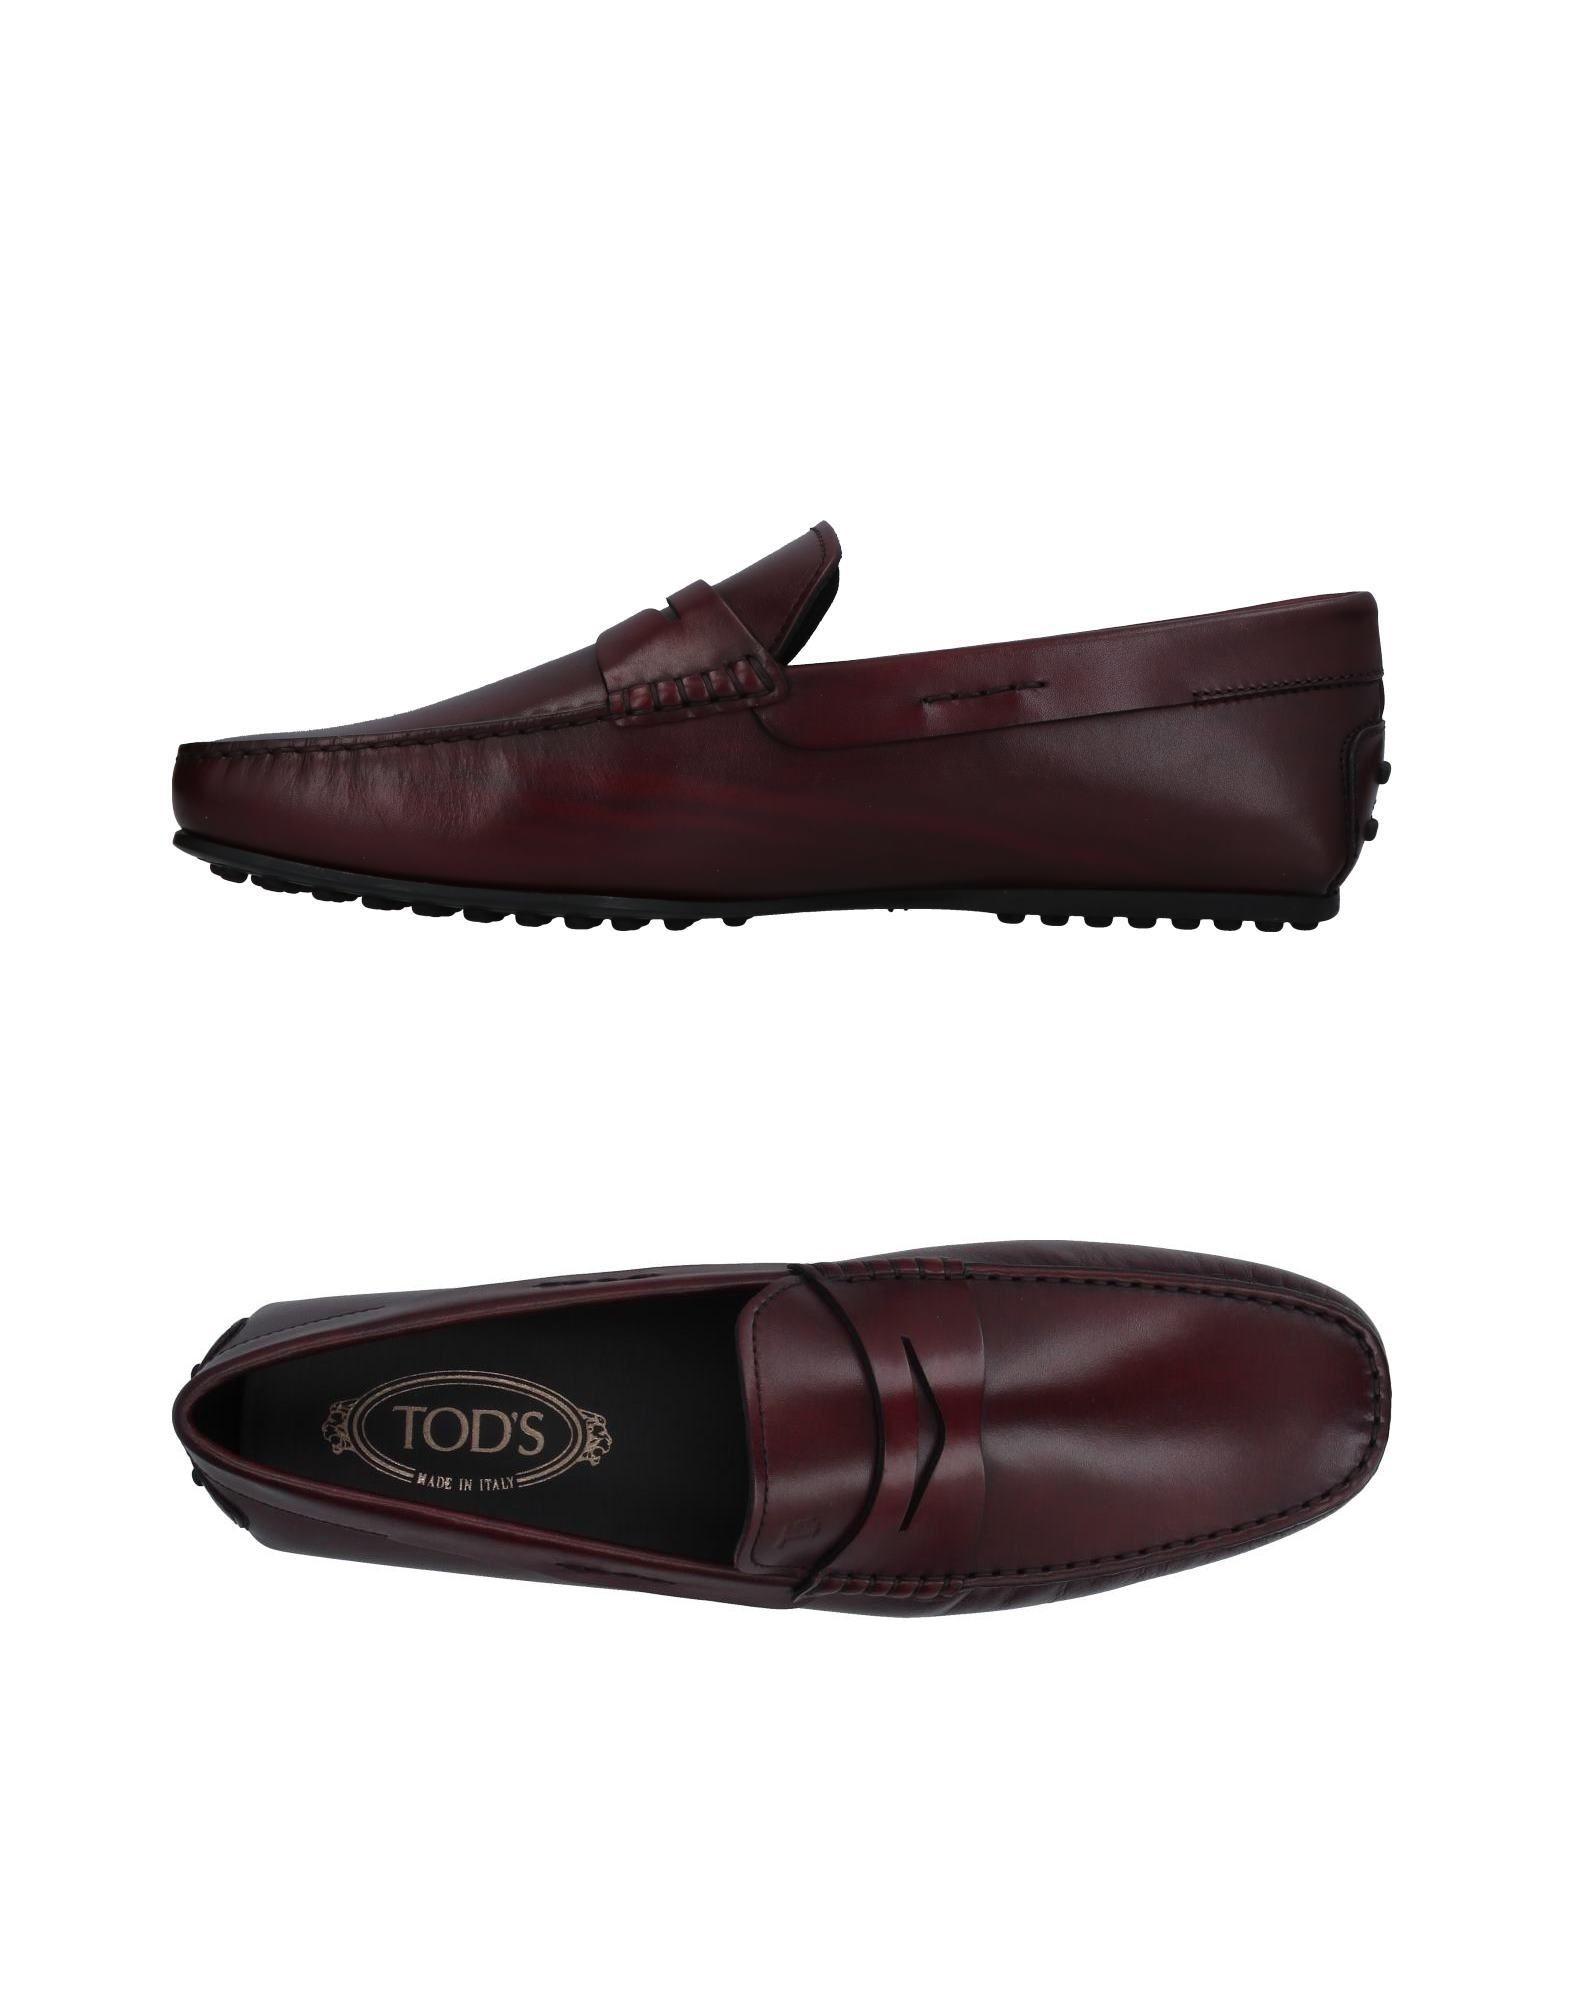 Tod's Mokassins Herren  11397971GK Gute Qualität beliebte Schuhe